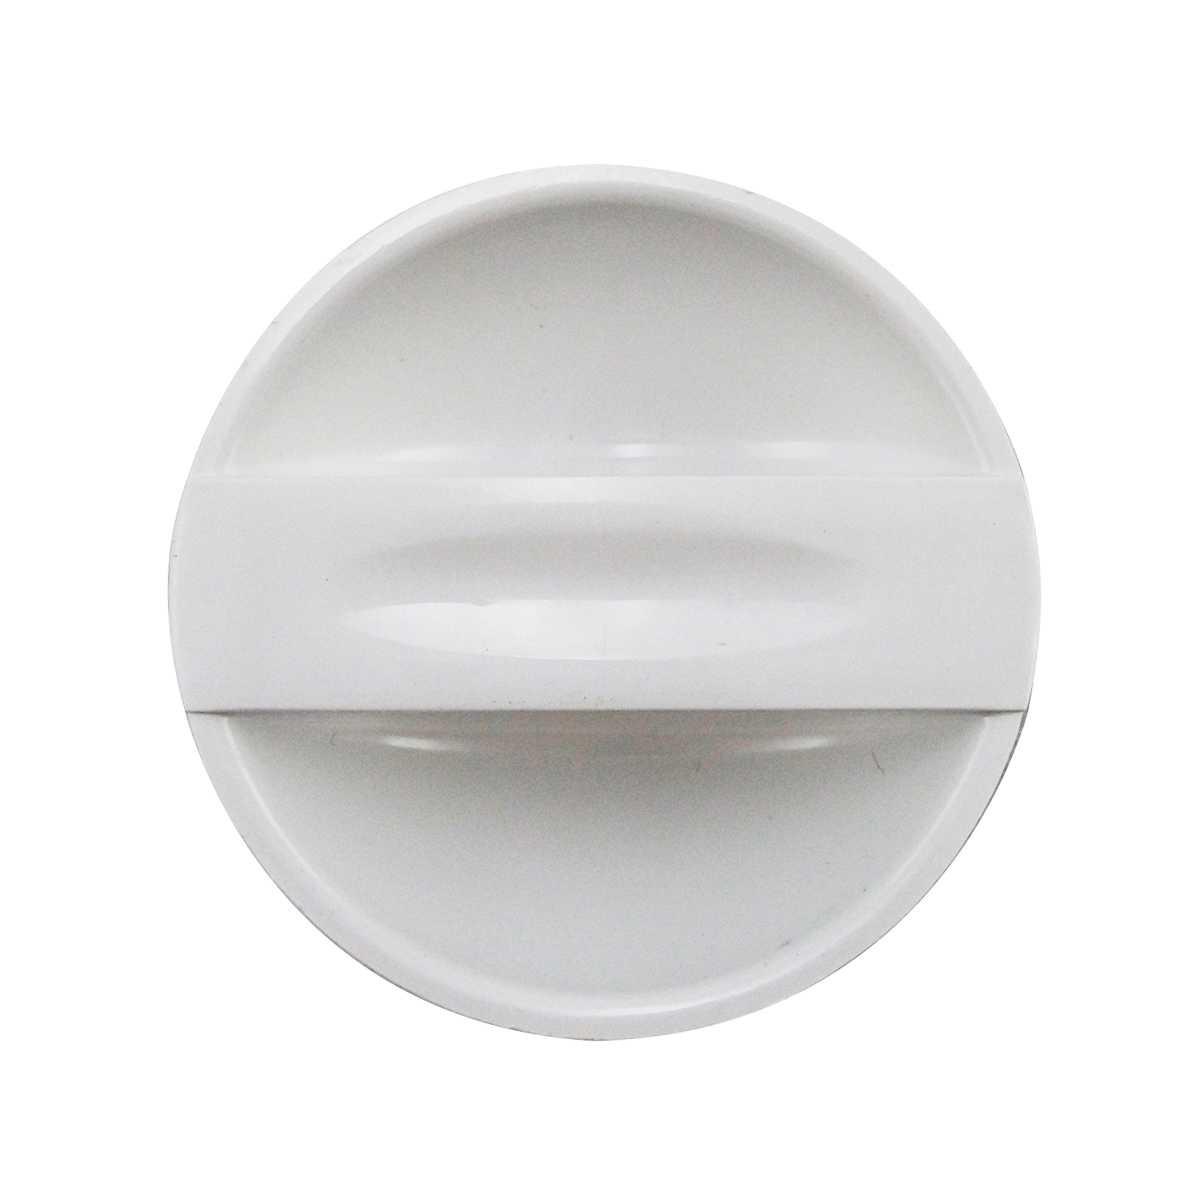 Botão nivel de agua lavadora Electrolux L8